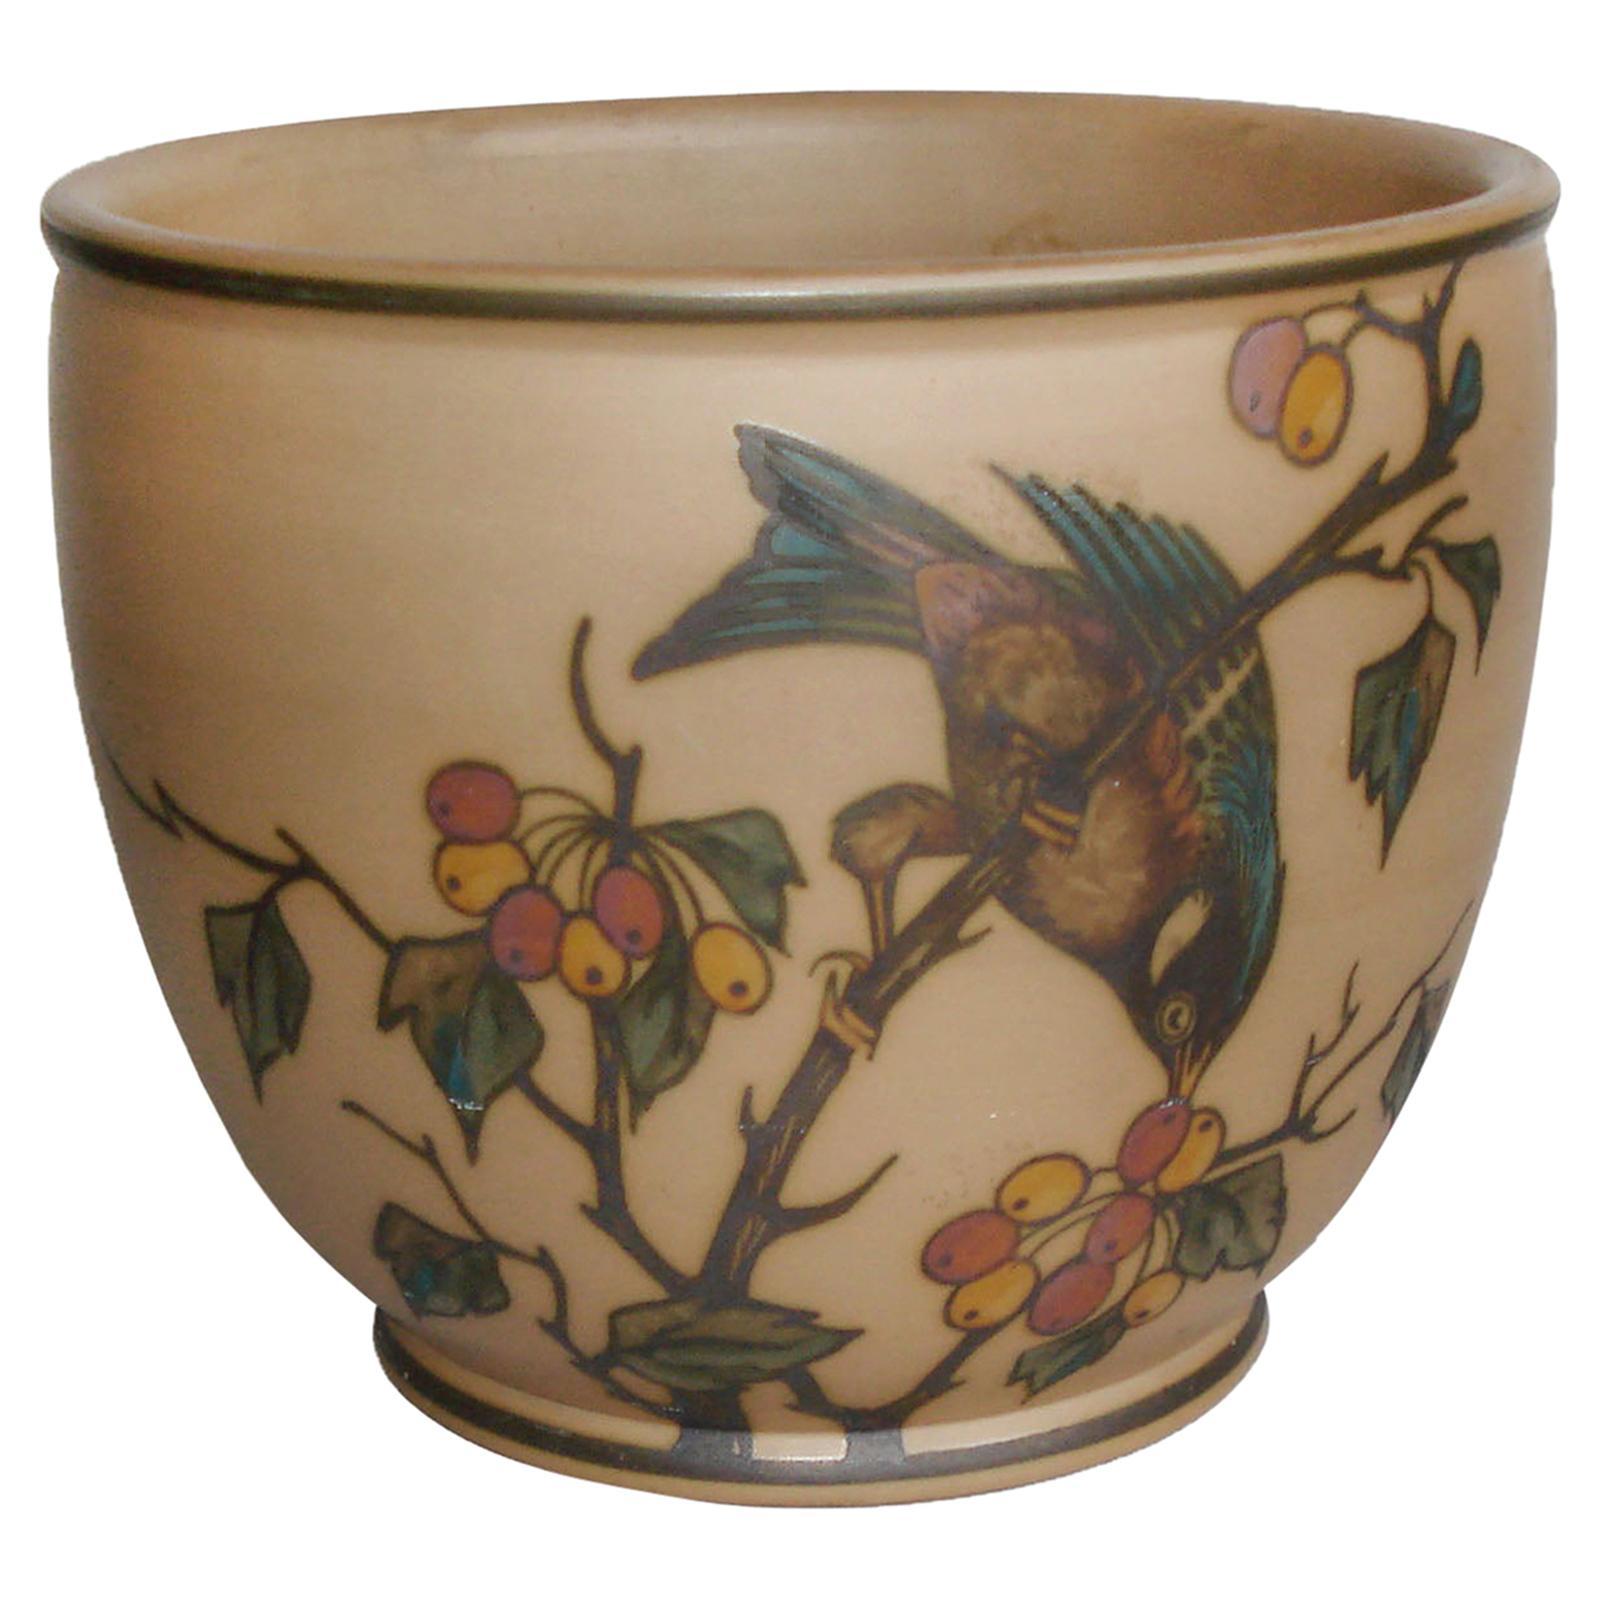 Art Deco Ceramic Flower Pot, Cachepot by Lauritz Hjorth, Bornholm, Denmark